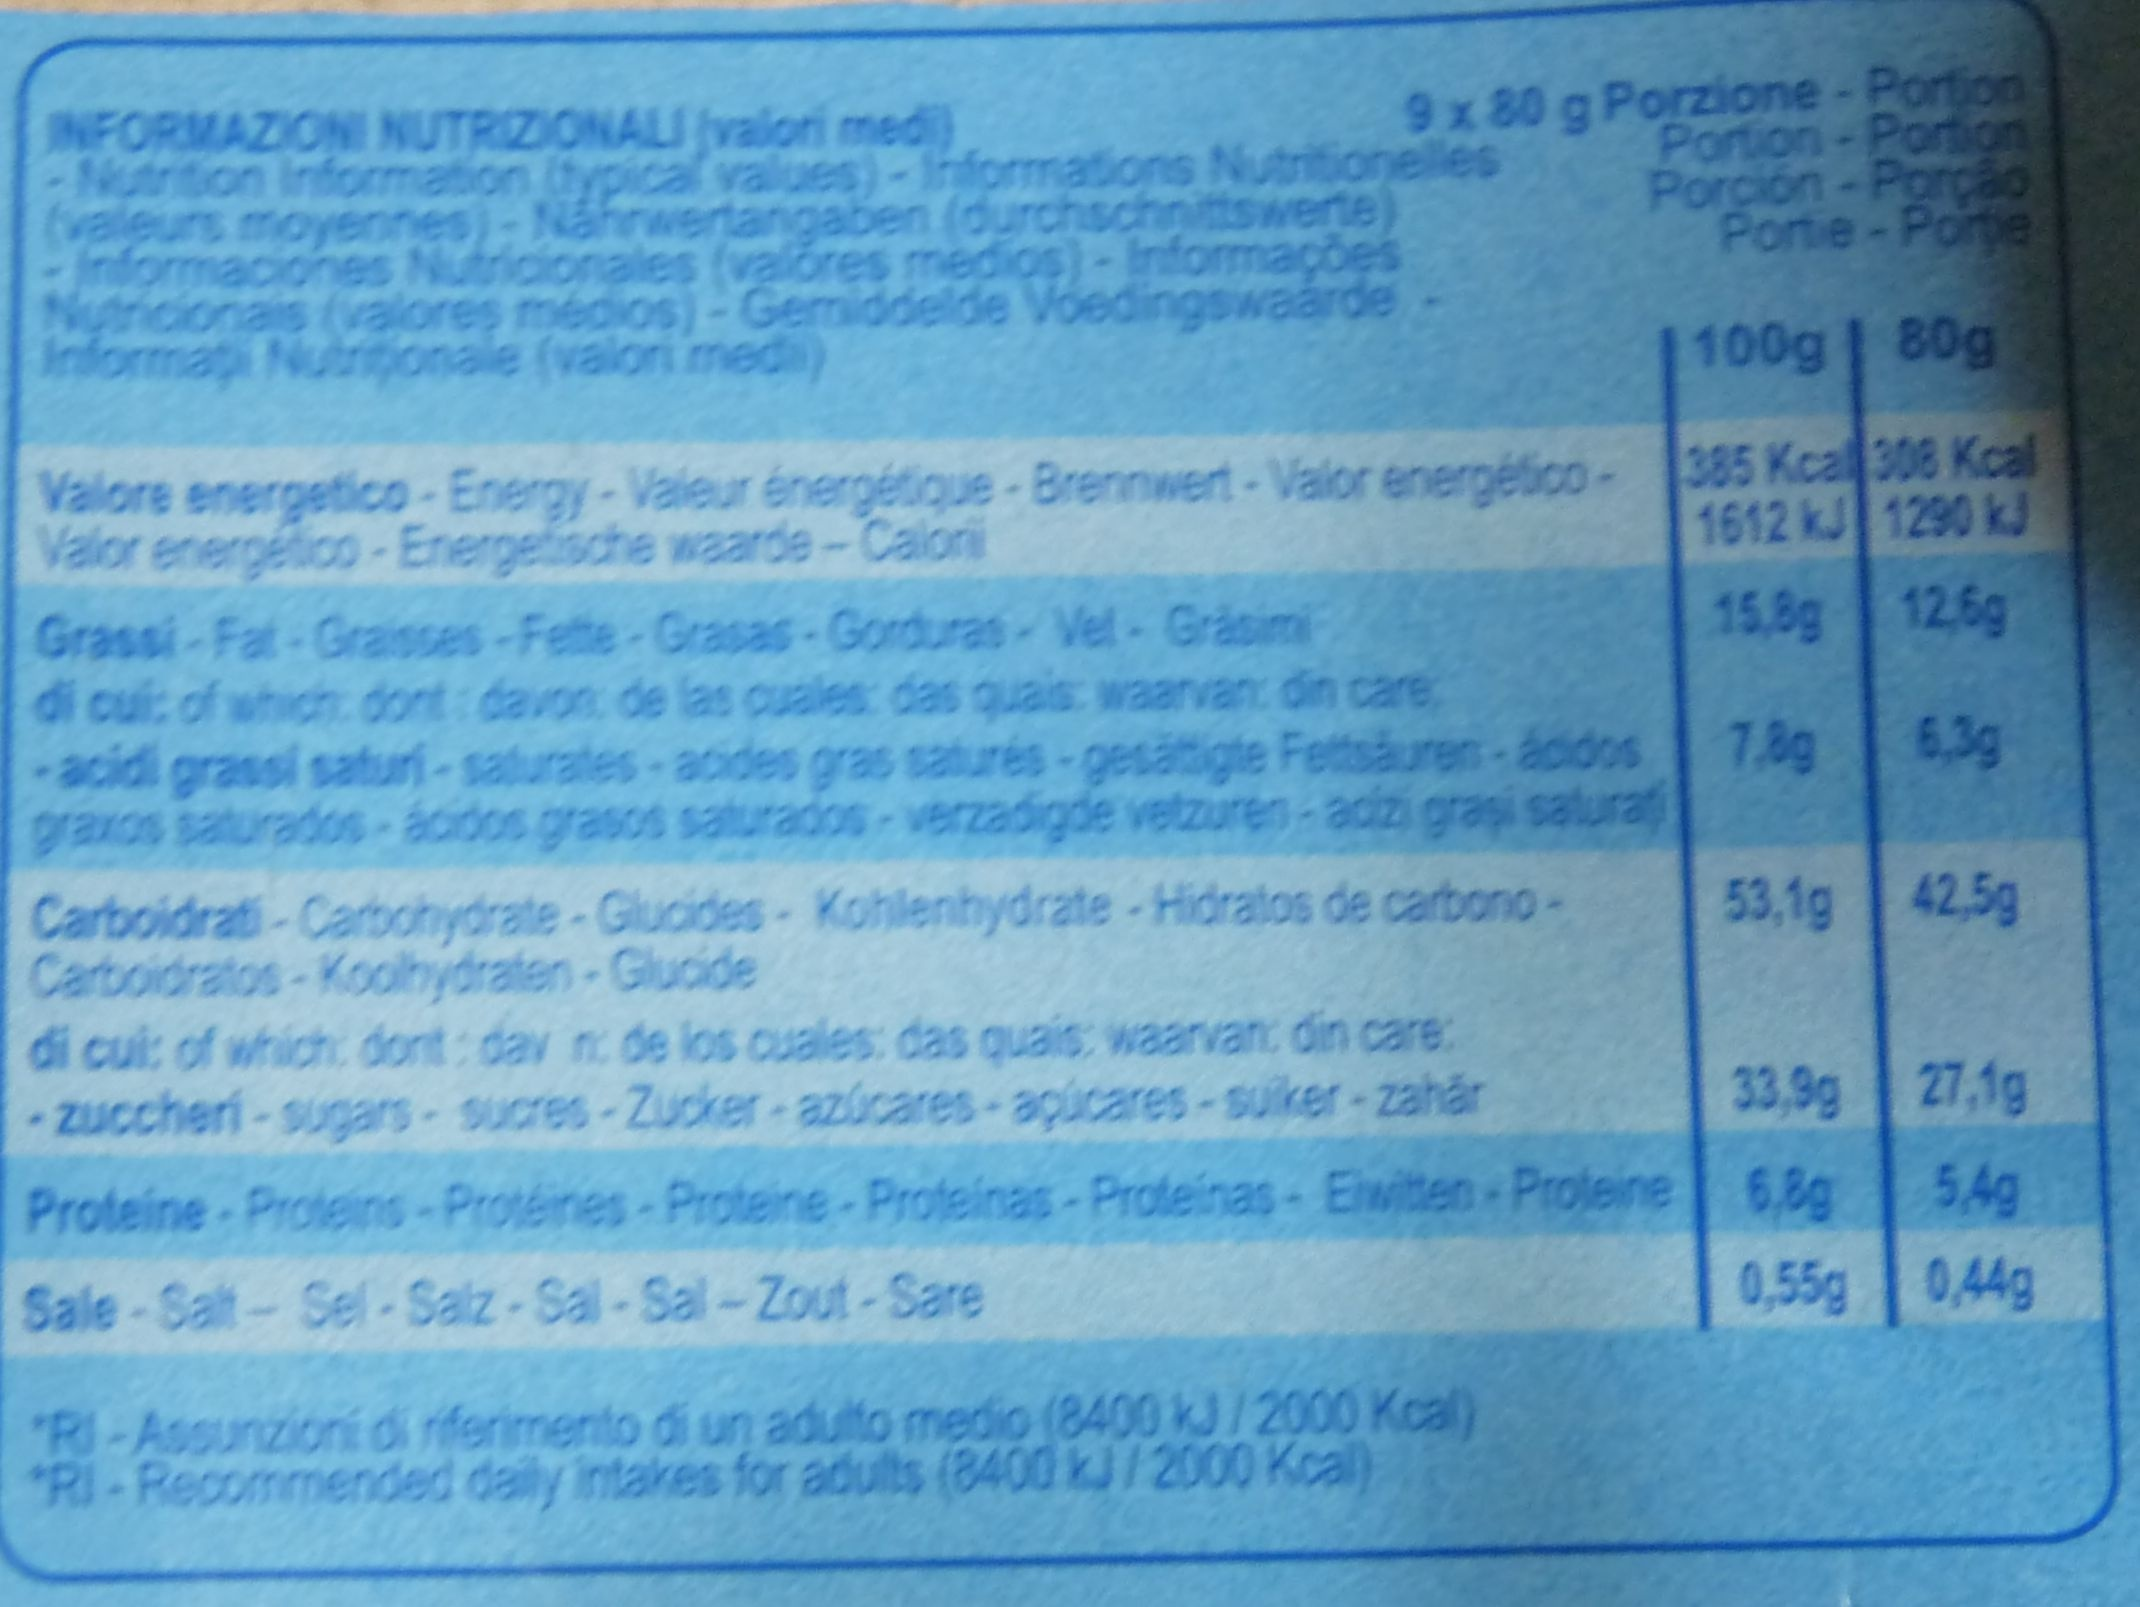 Melegatti Panettone due delizie - Nutrition facts - it